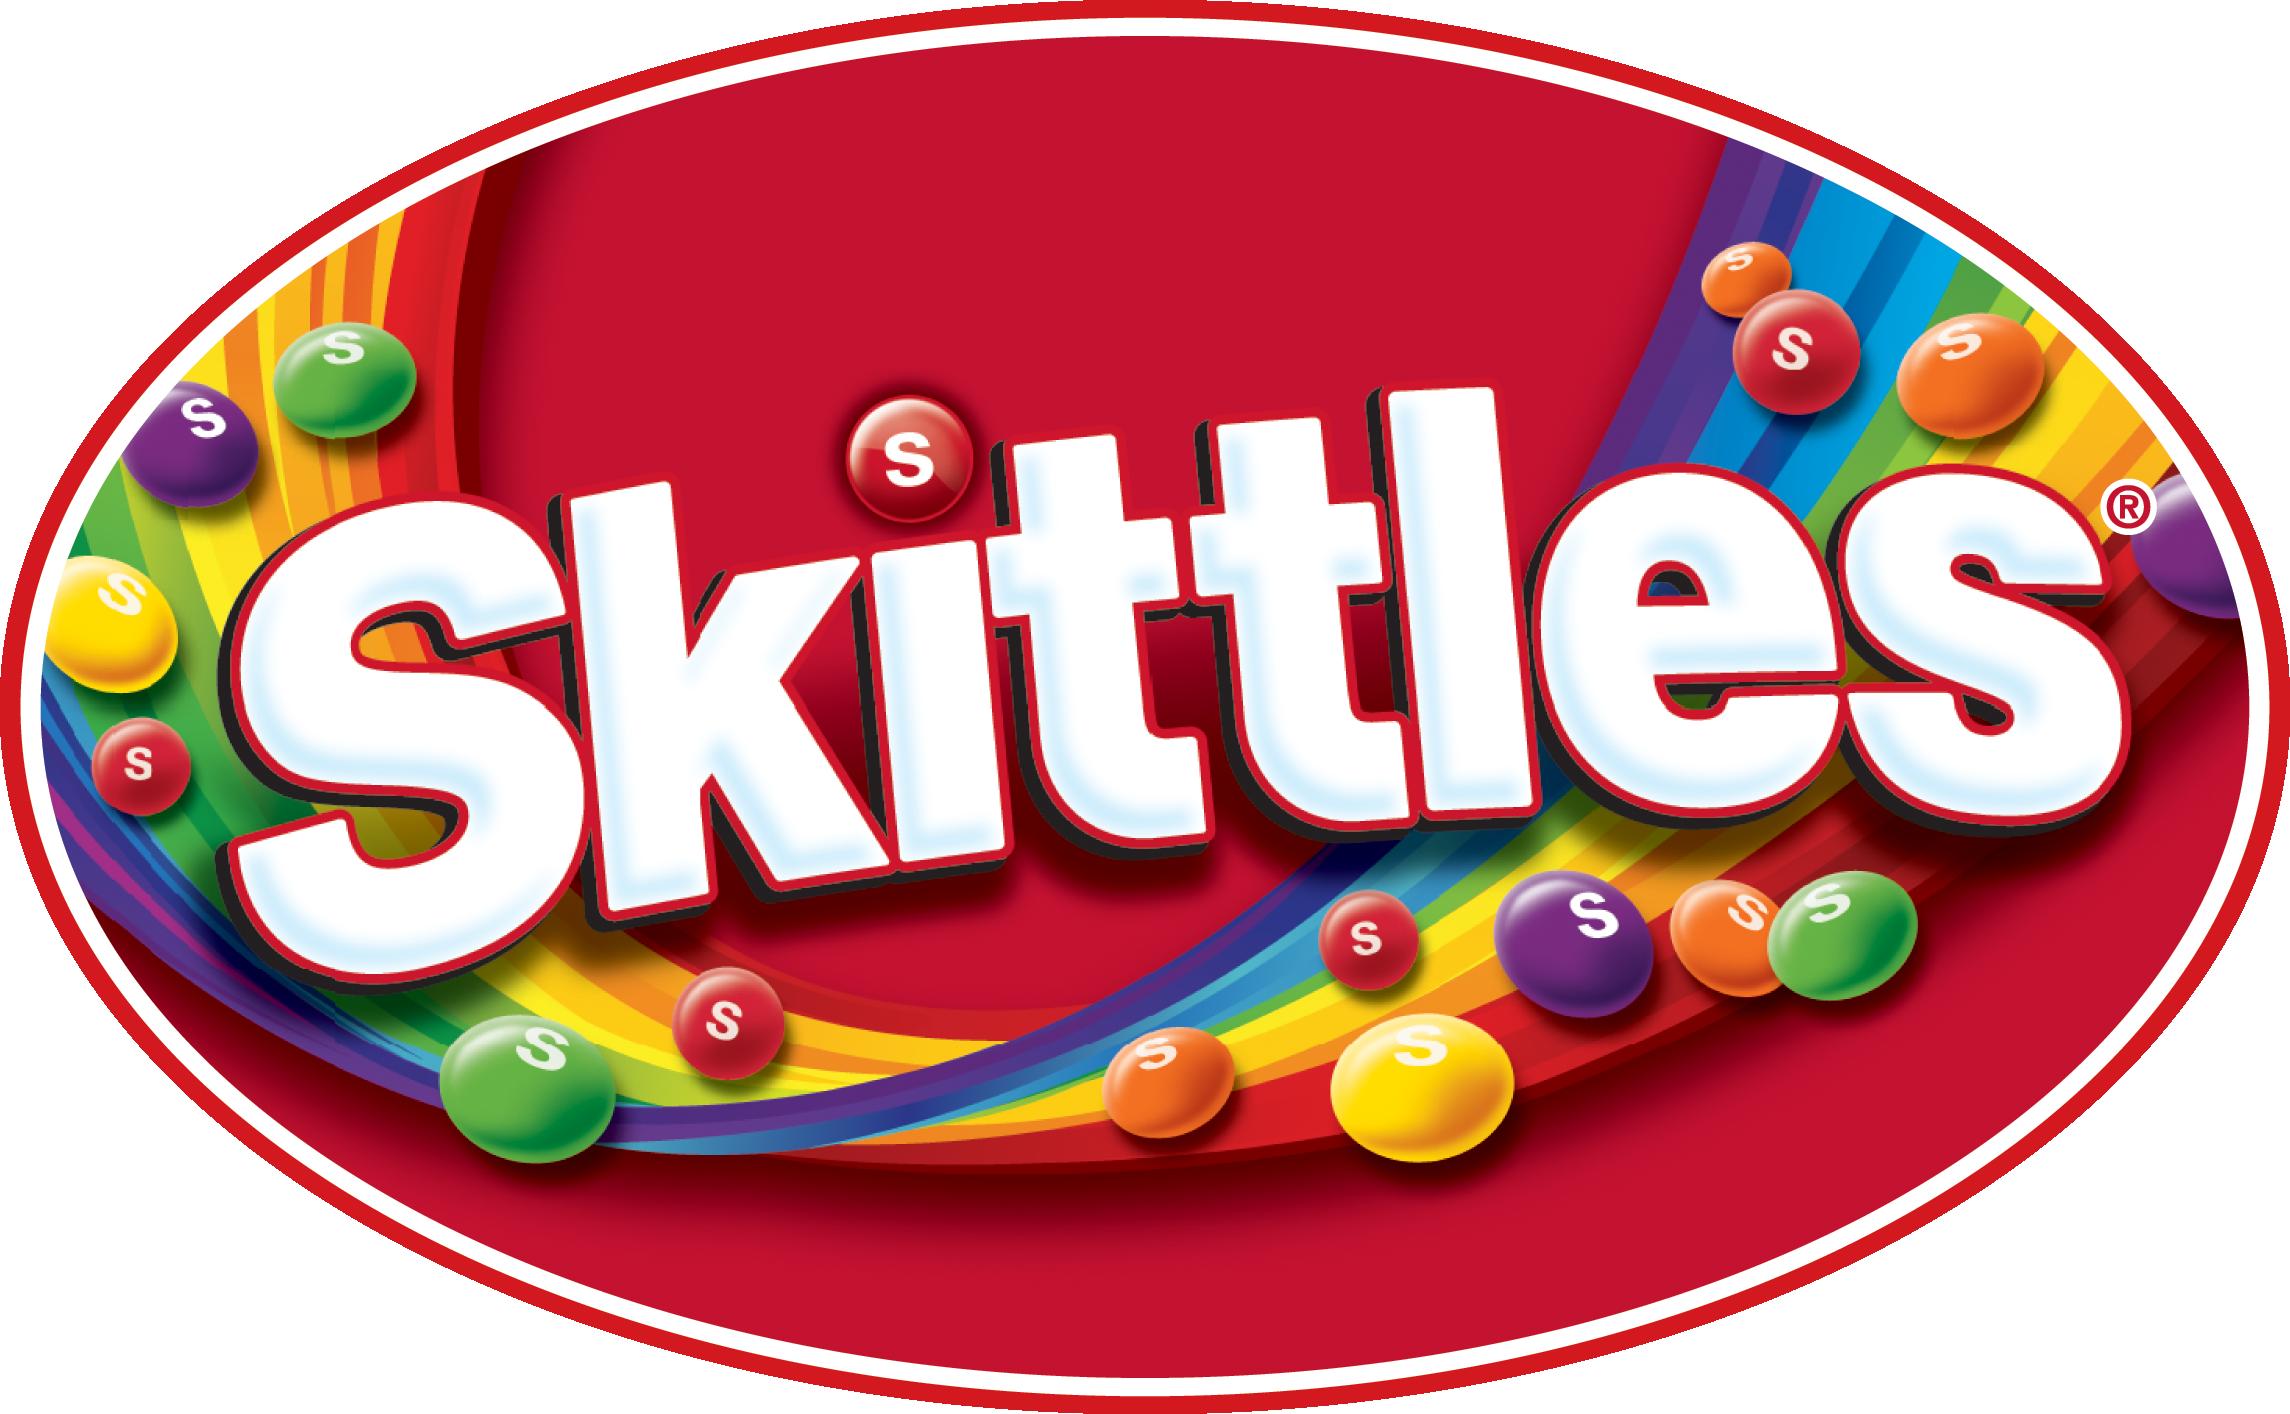 Skittles clipart